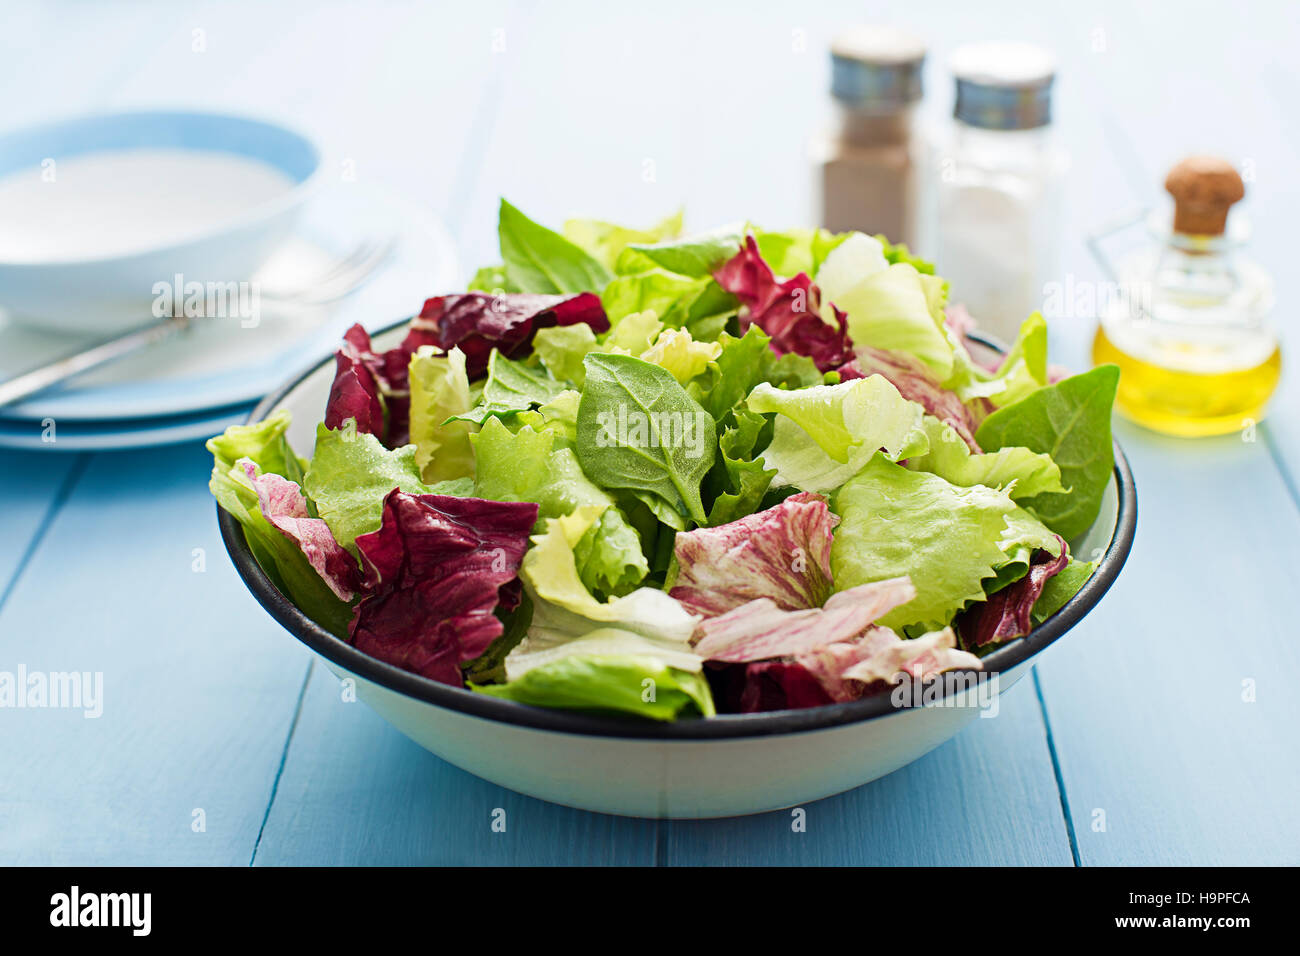 Salade verte fraîche dans un bol, Close up Photo Stock